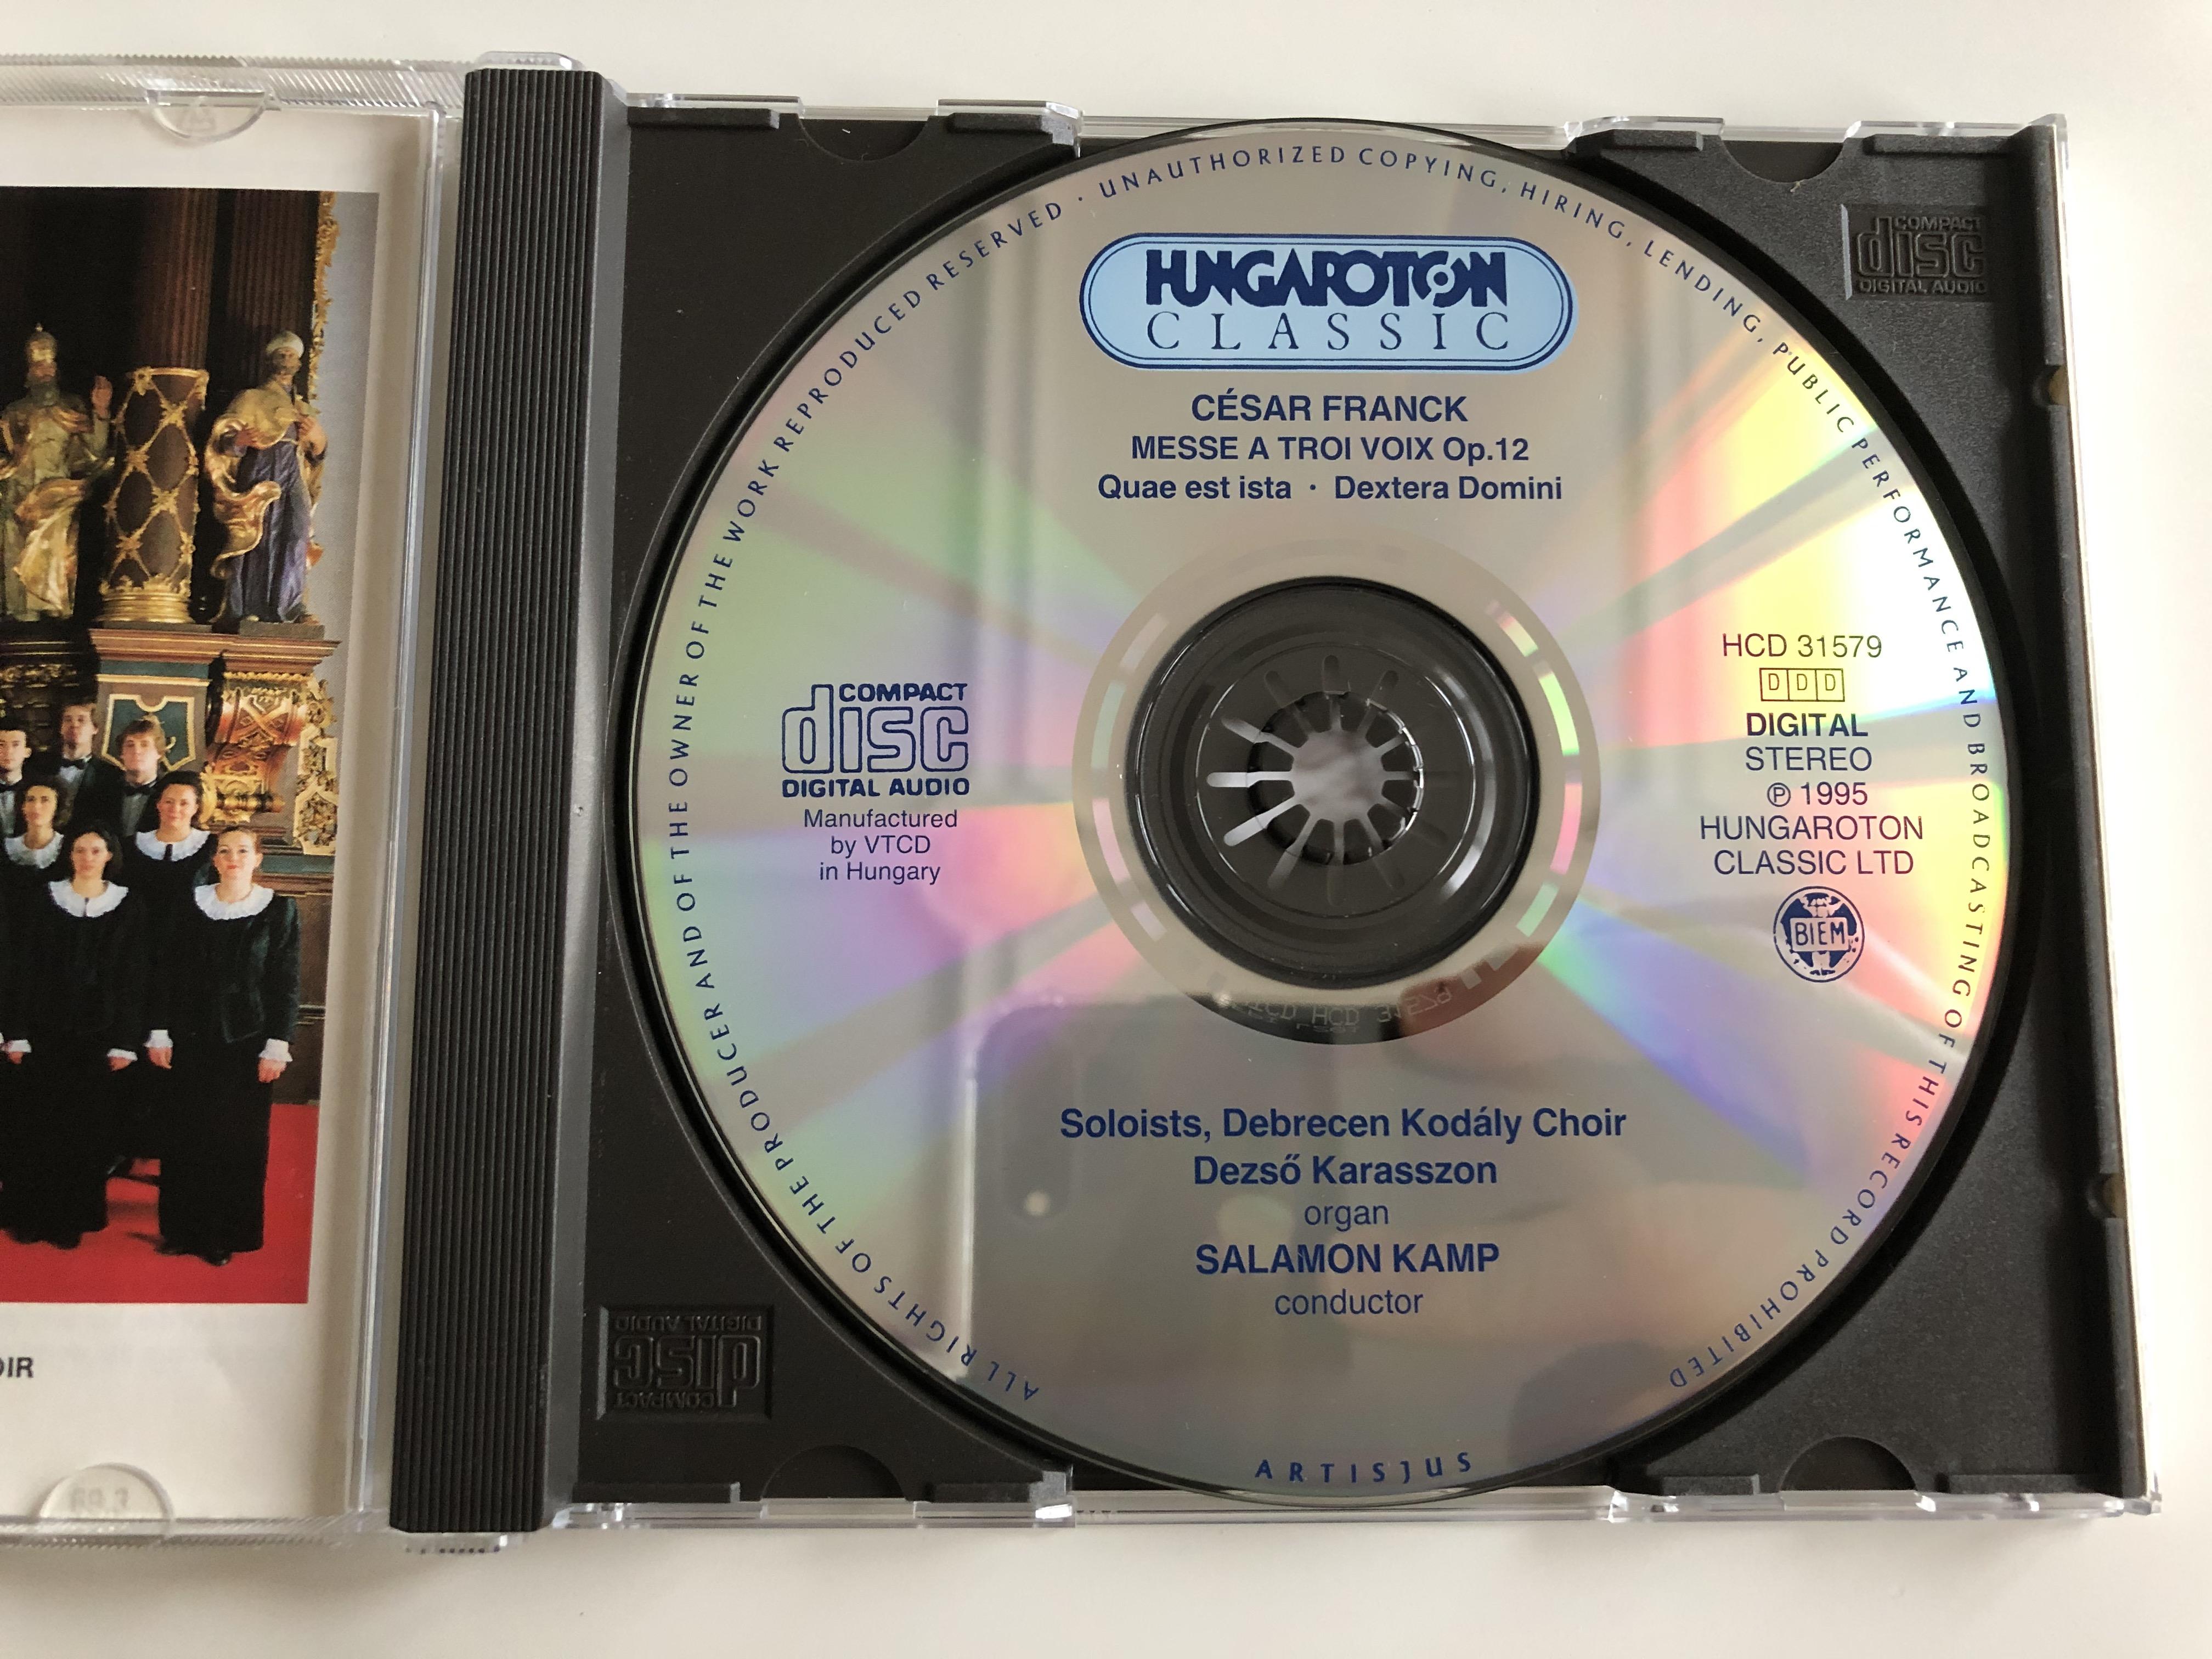 c-sar-franck-messe-a-troi-voix-quae-est-ista-dextera-domini-debrecen-kodaly-choir-dezso-karasszon-organ-salamon-kamp-hungaroton-classic-audio-cd-1995-stereo-hcd-31579-10-.jpg